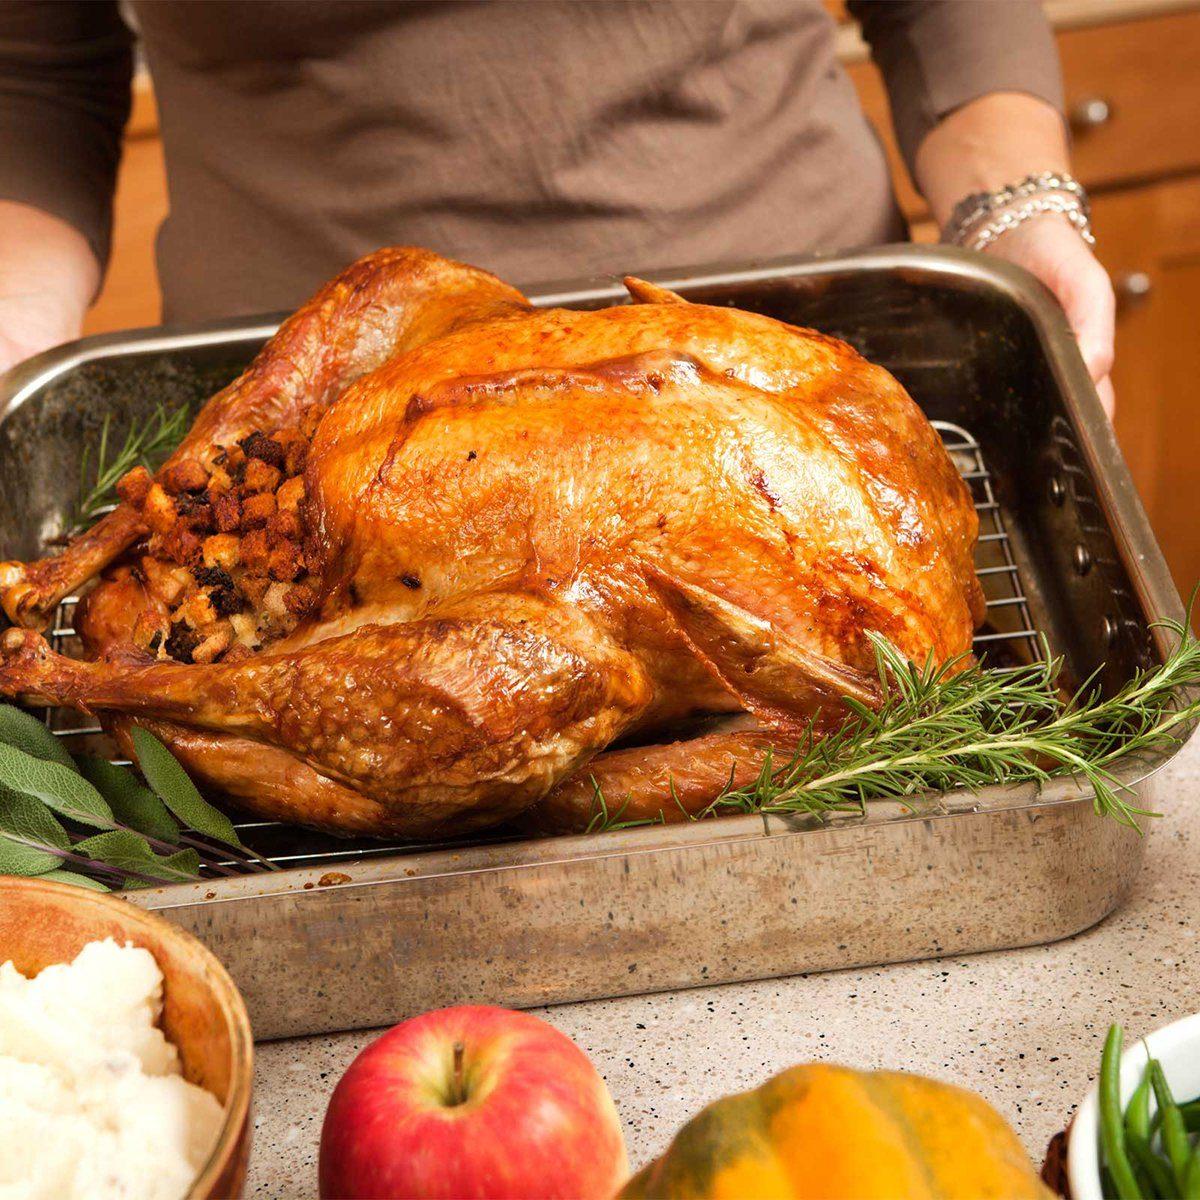 Serving a roast turkey